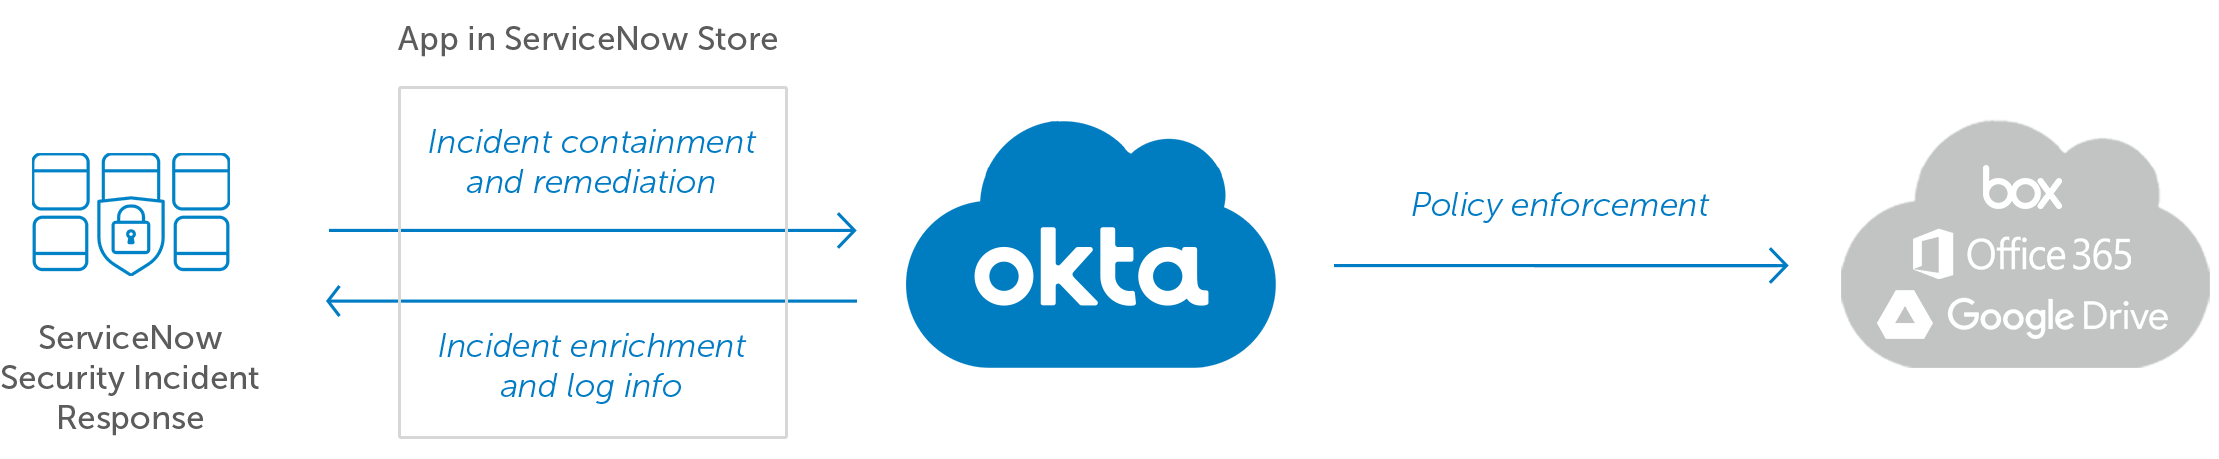 ServiceNow Security Incident ResponseとOktaの図1